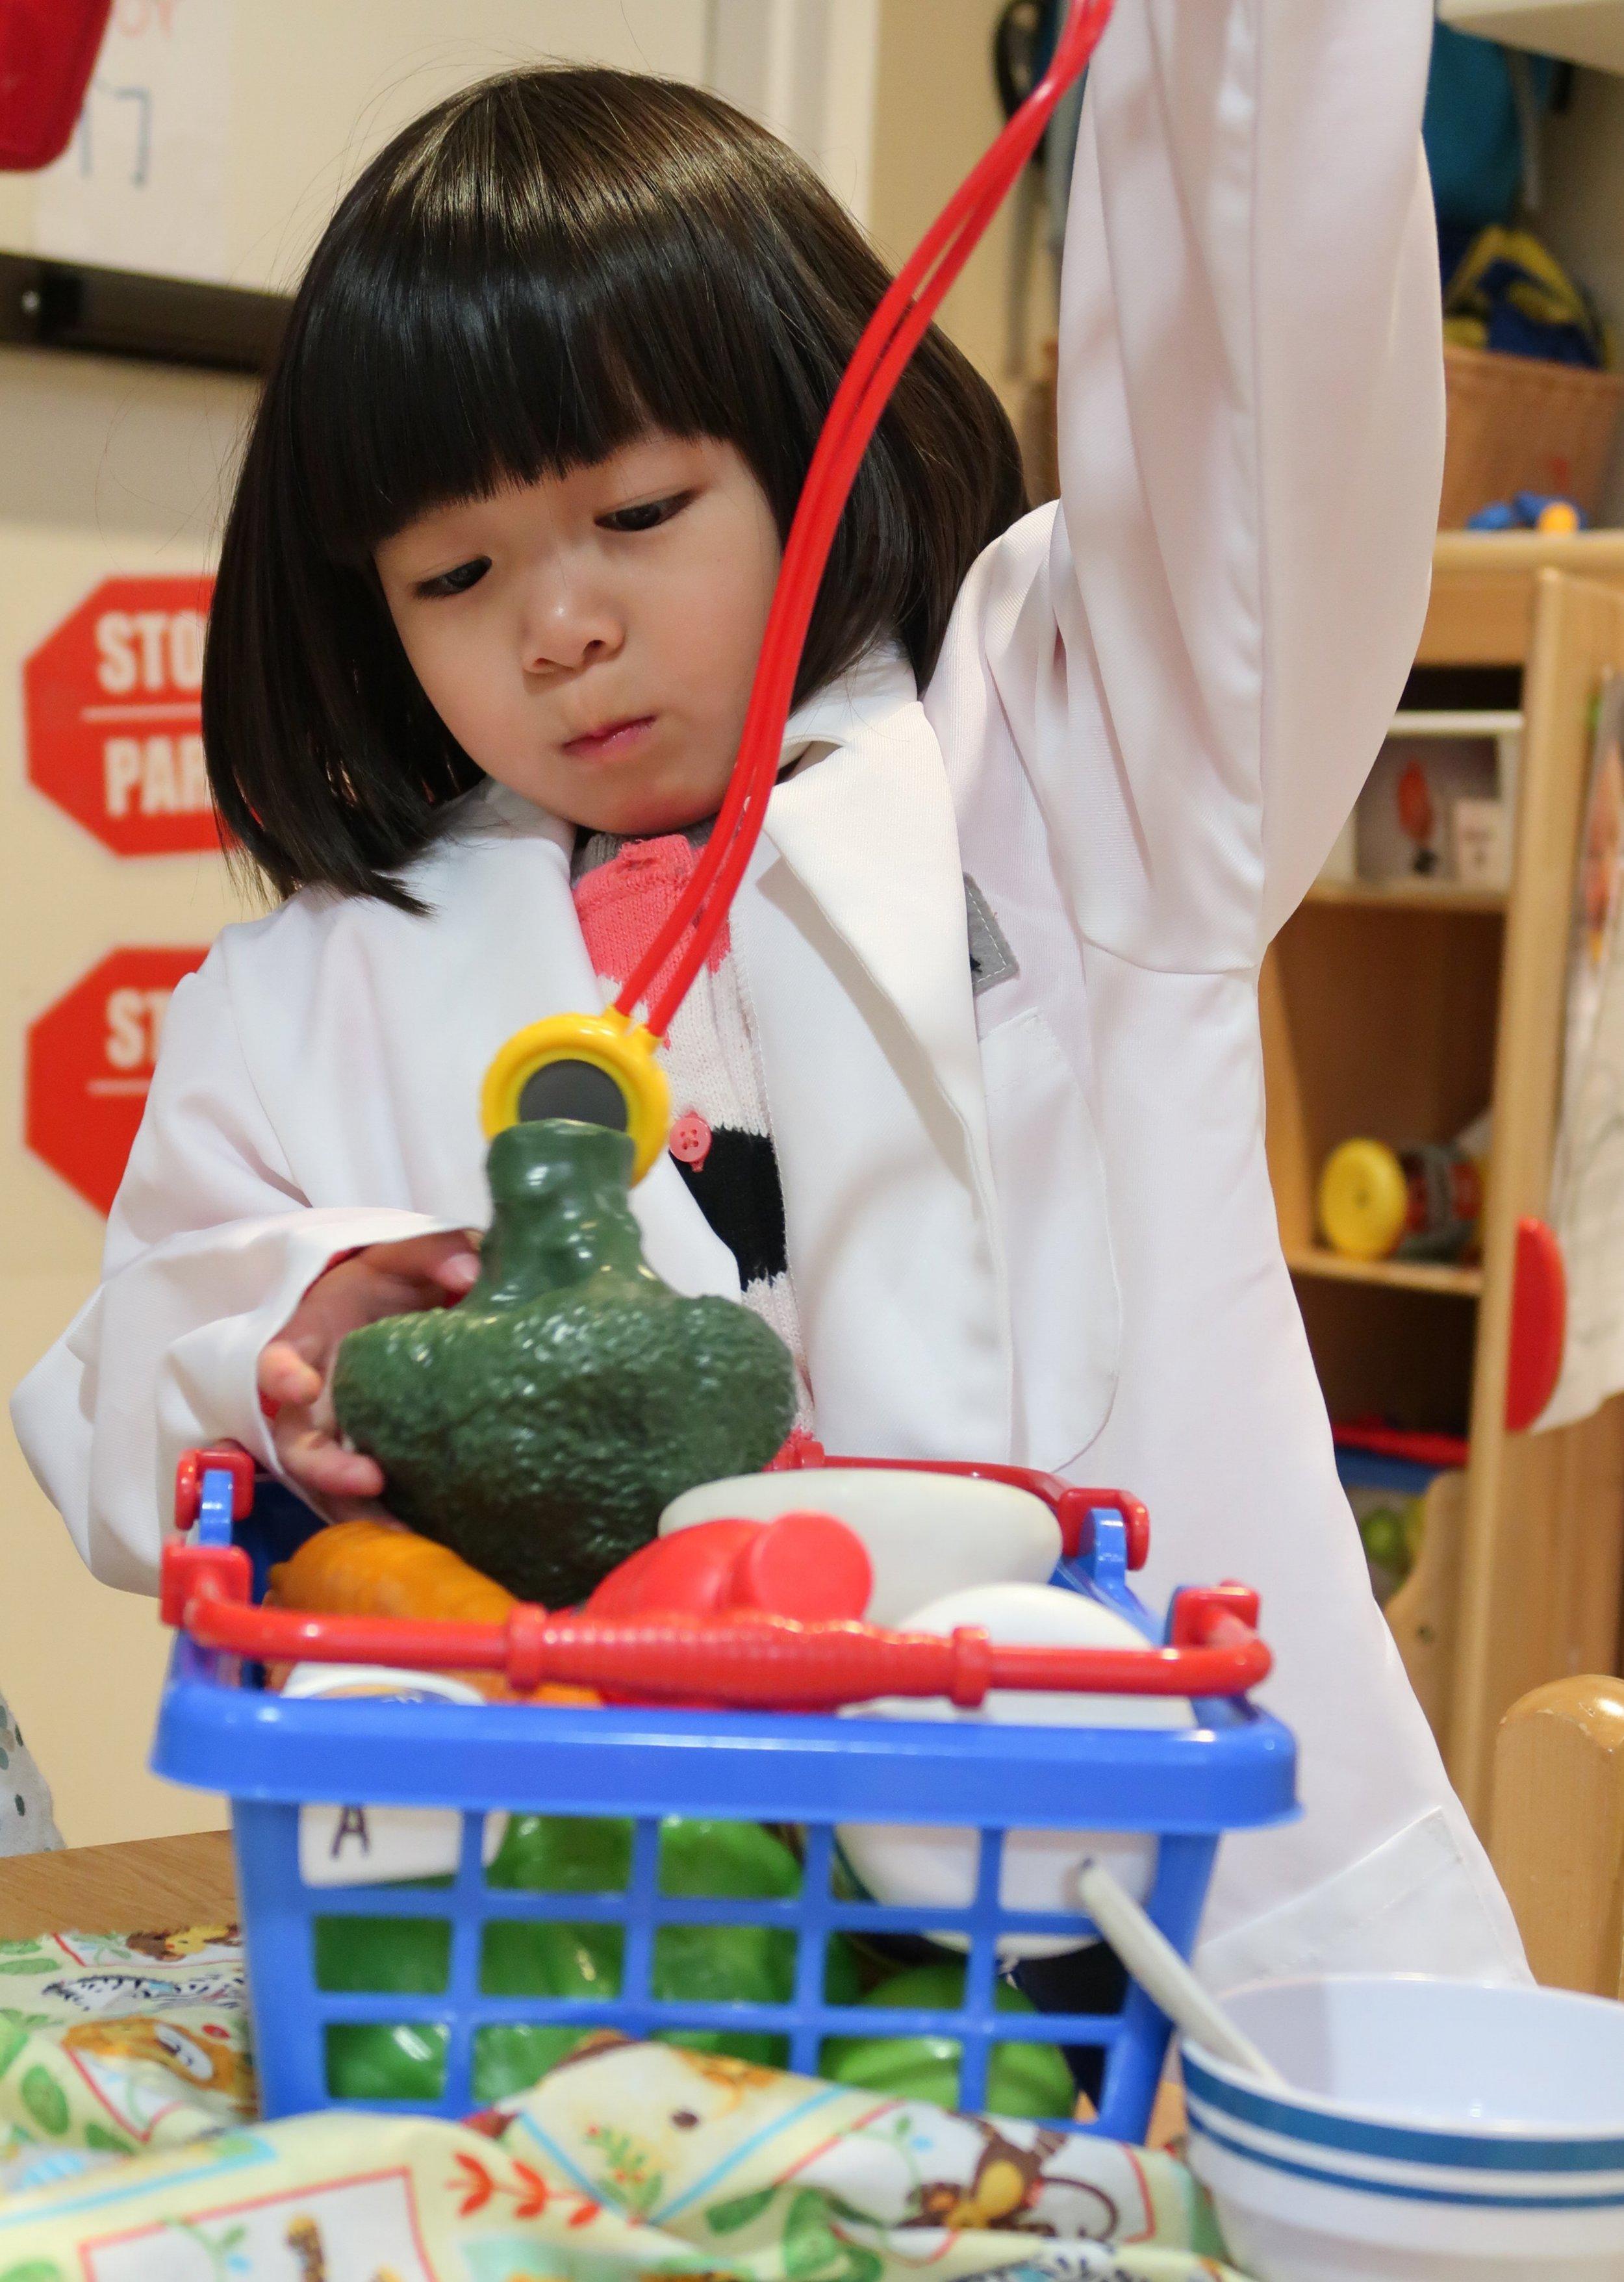 Playtime at Lok Yuen Child Development Center